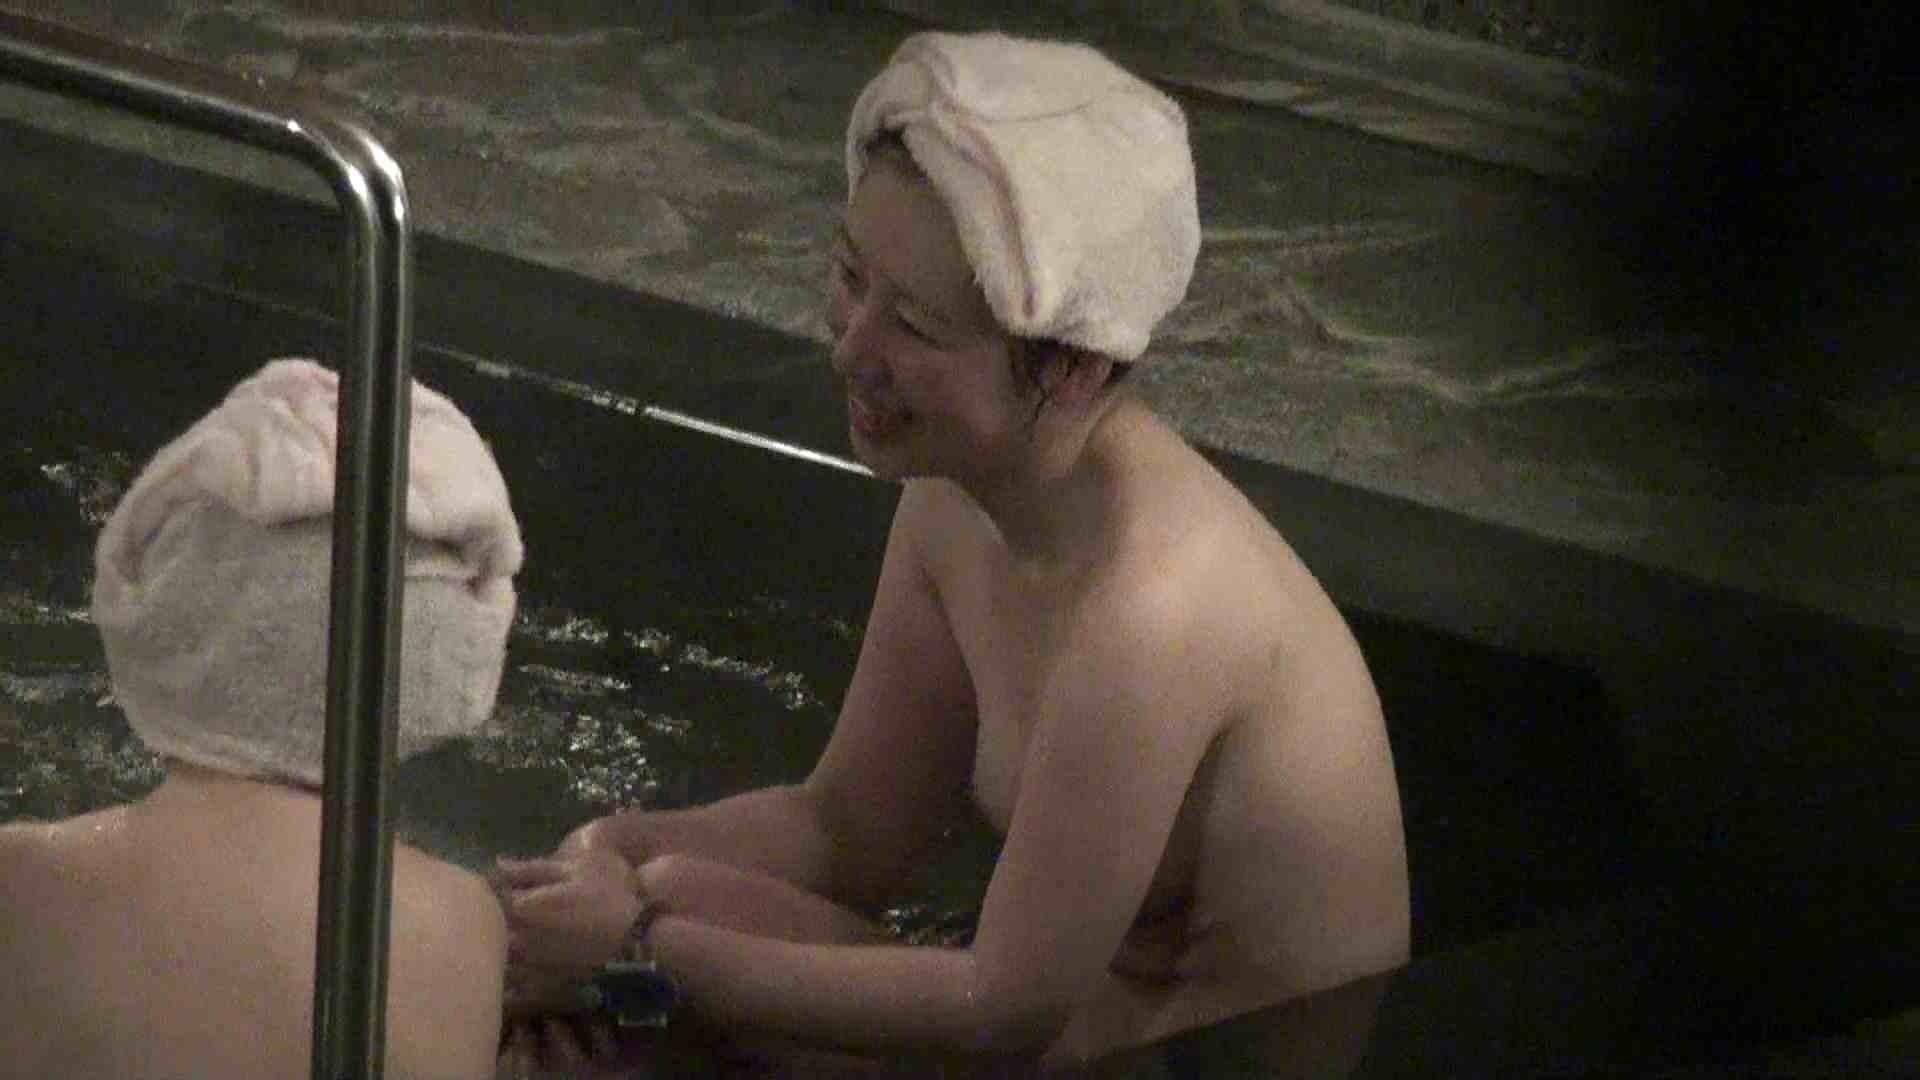 Aquaな露天風呂Vol.416 露天覗き すけべAV動画紹介 77枚